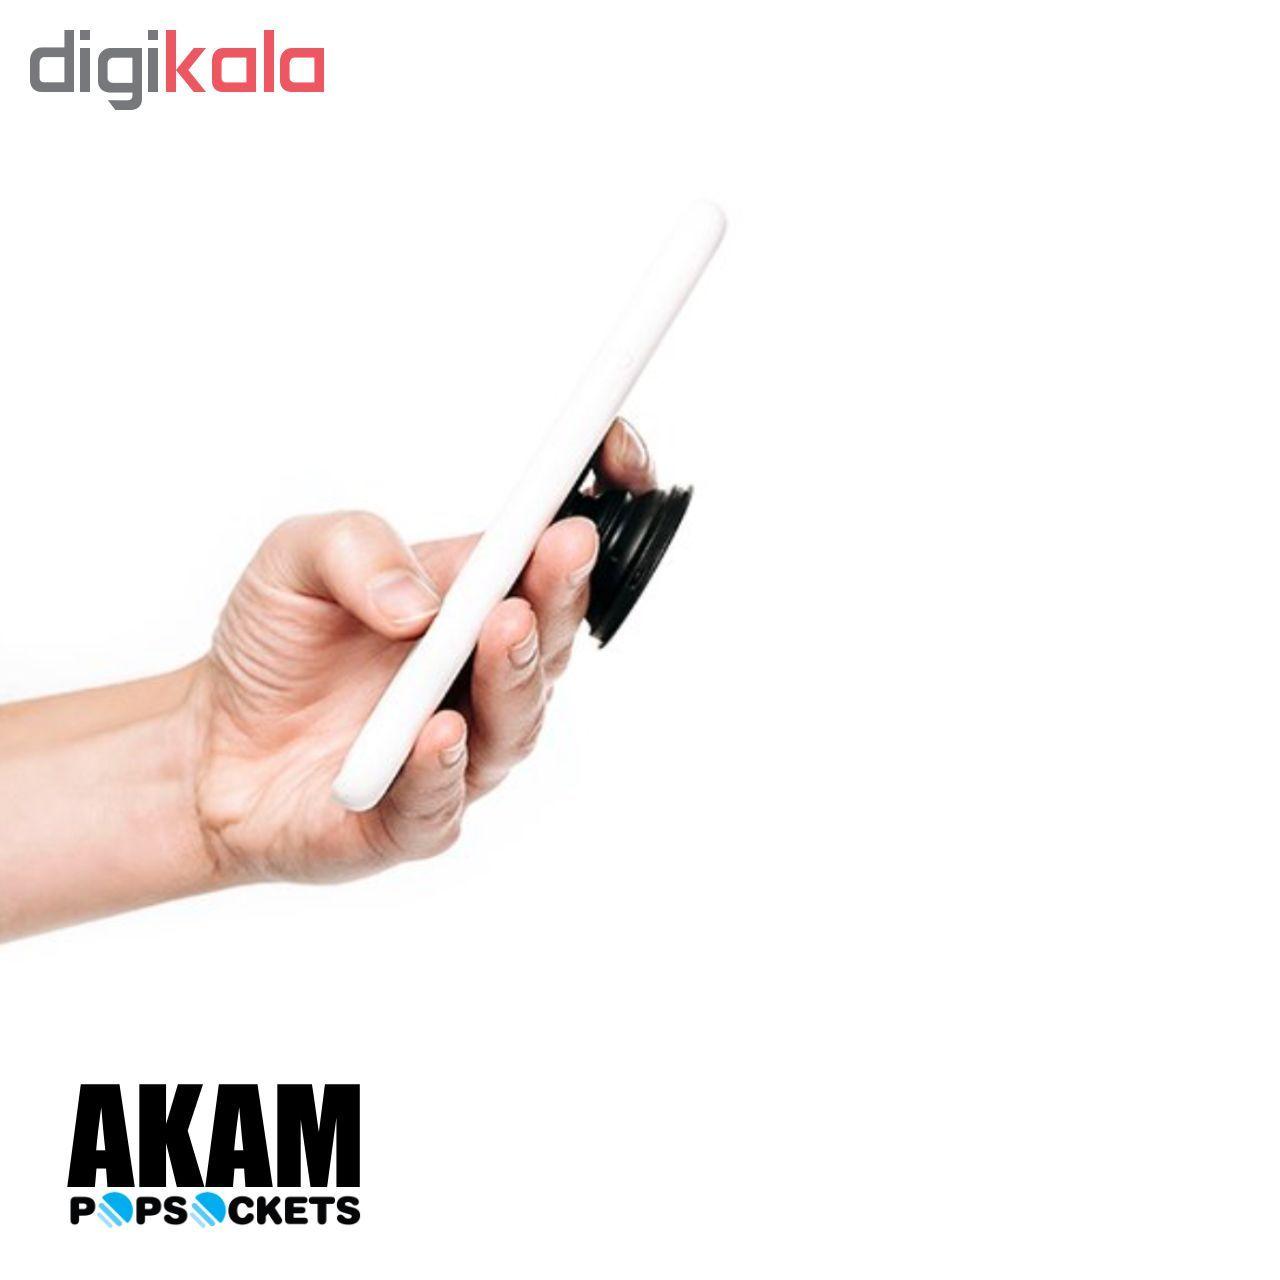 پایه نگهدارنده گوشی موبایل پاپ سوکت آکام مدل APS0101 main 1 6